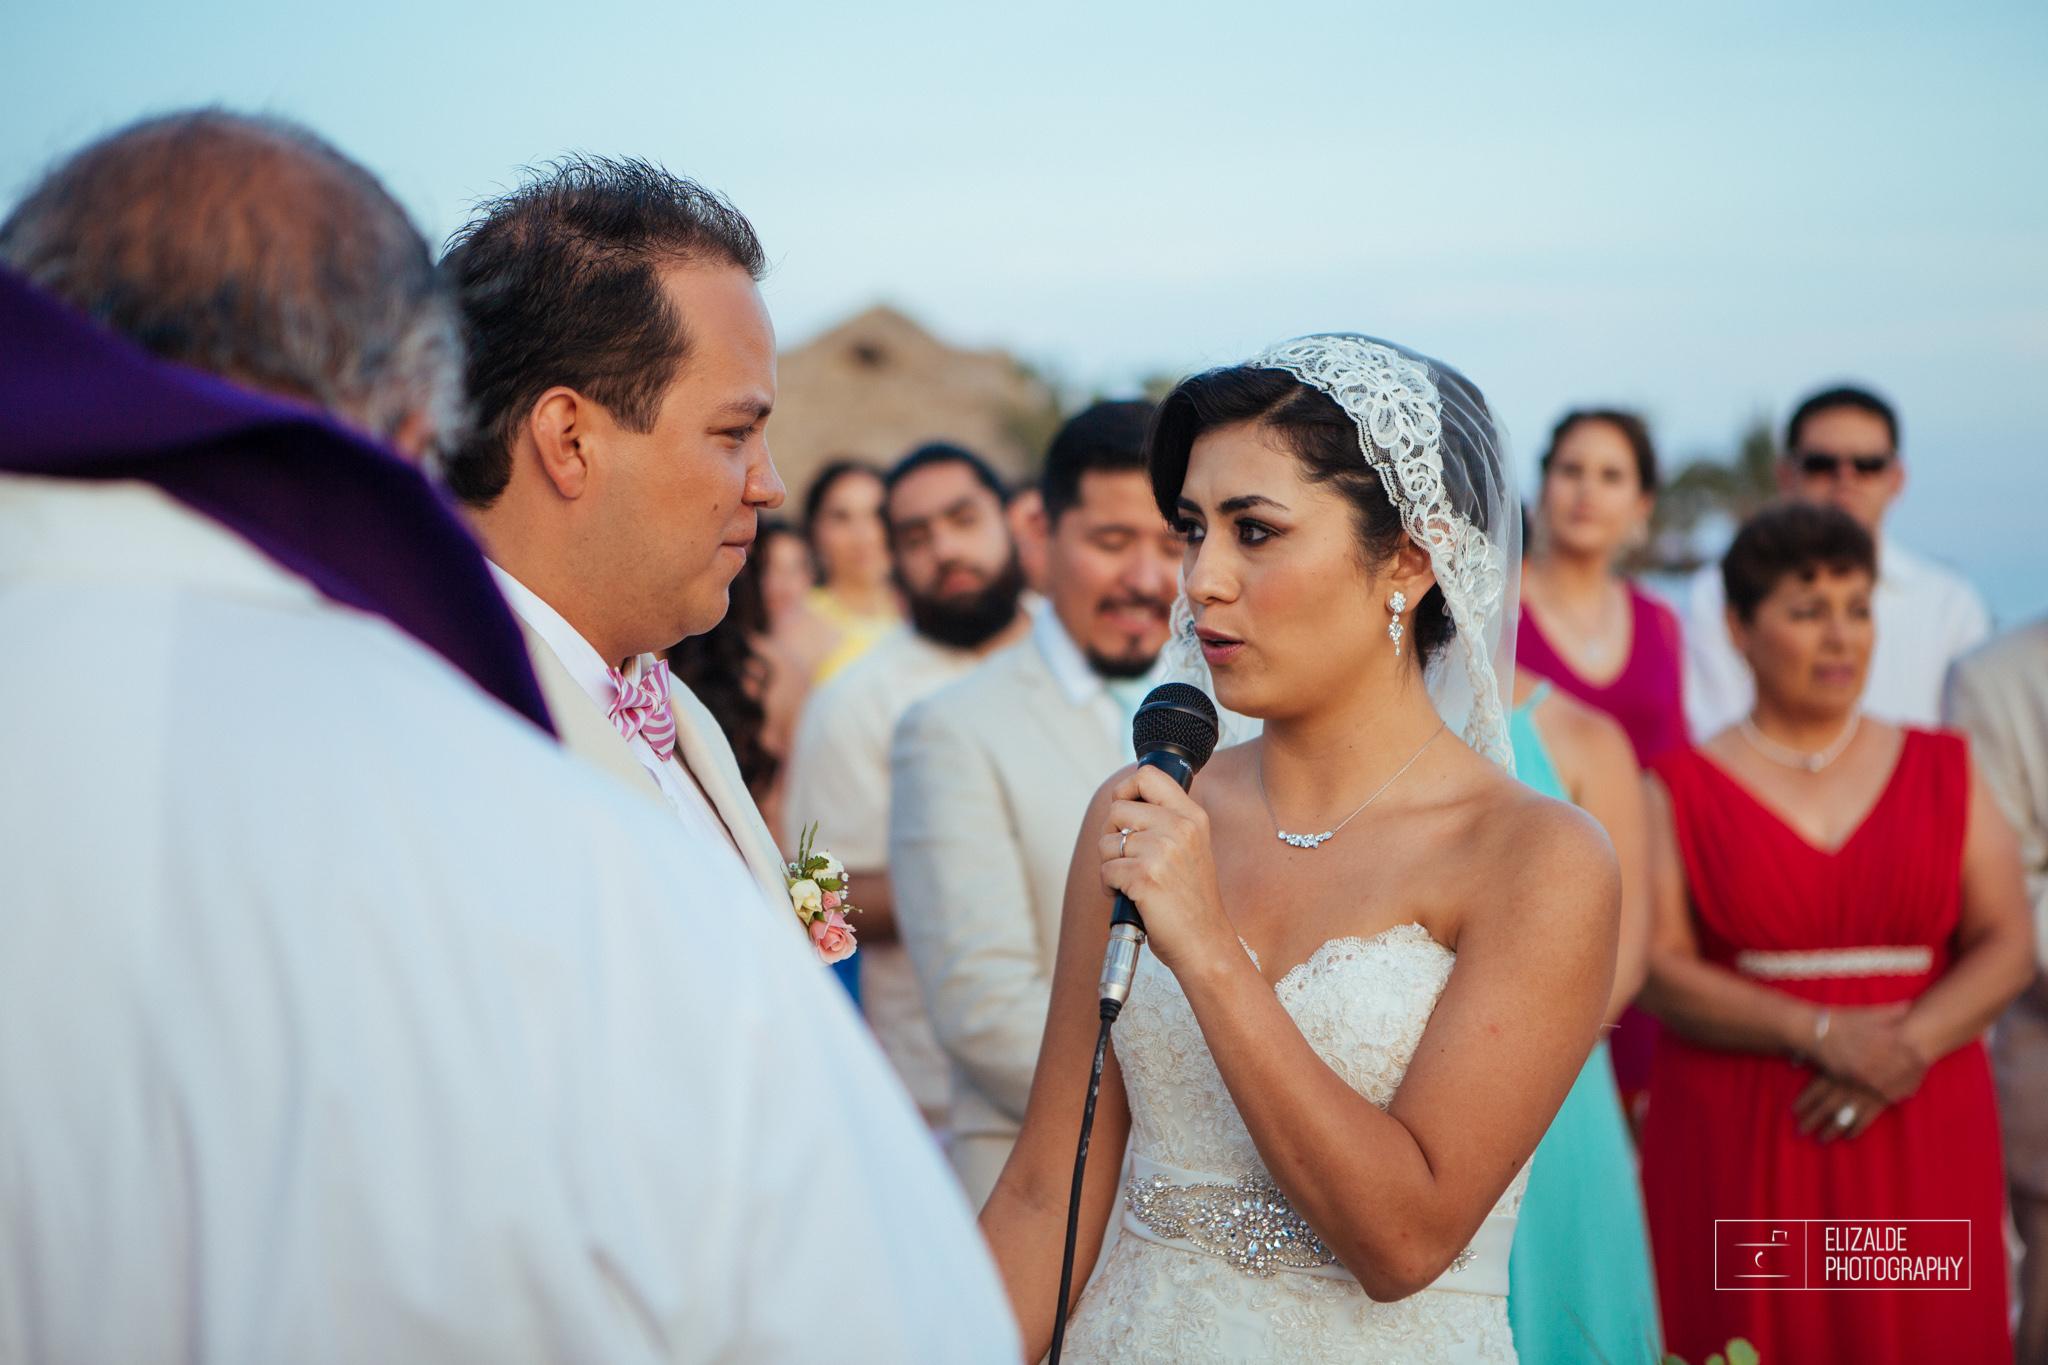 Pay and Ferran_Acapulco_Destination Wedding_Elizalde Photography-95.jpg